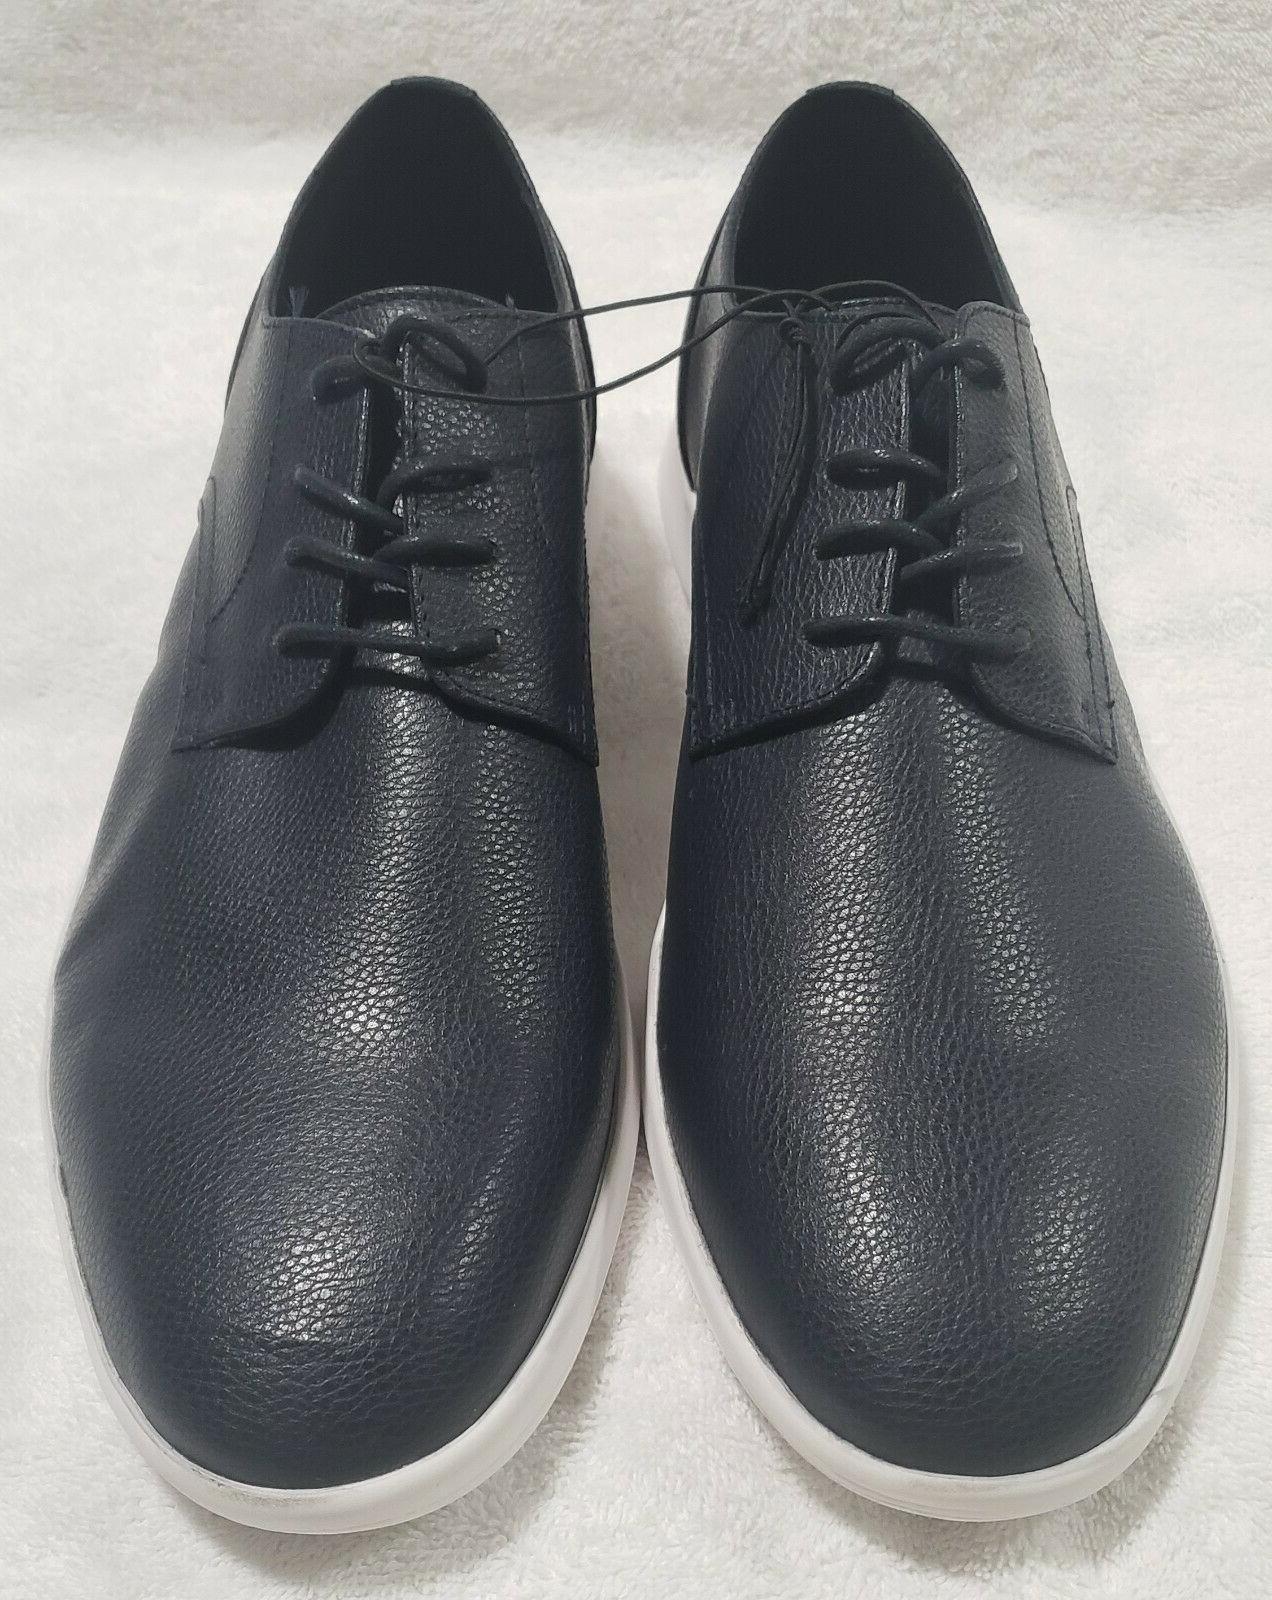 NWOB Cornelius Men's Dress Shoes - Size